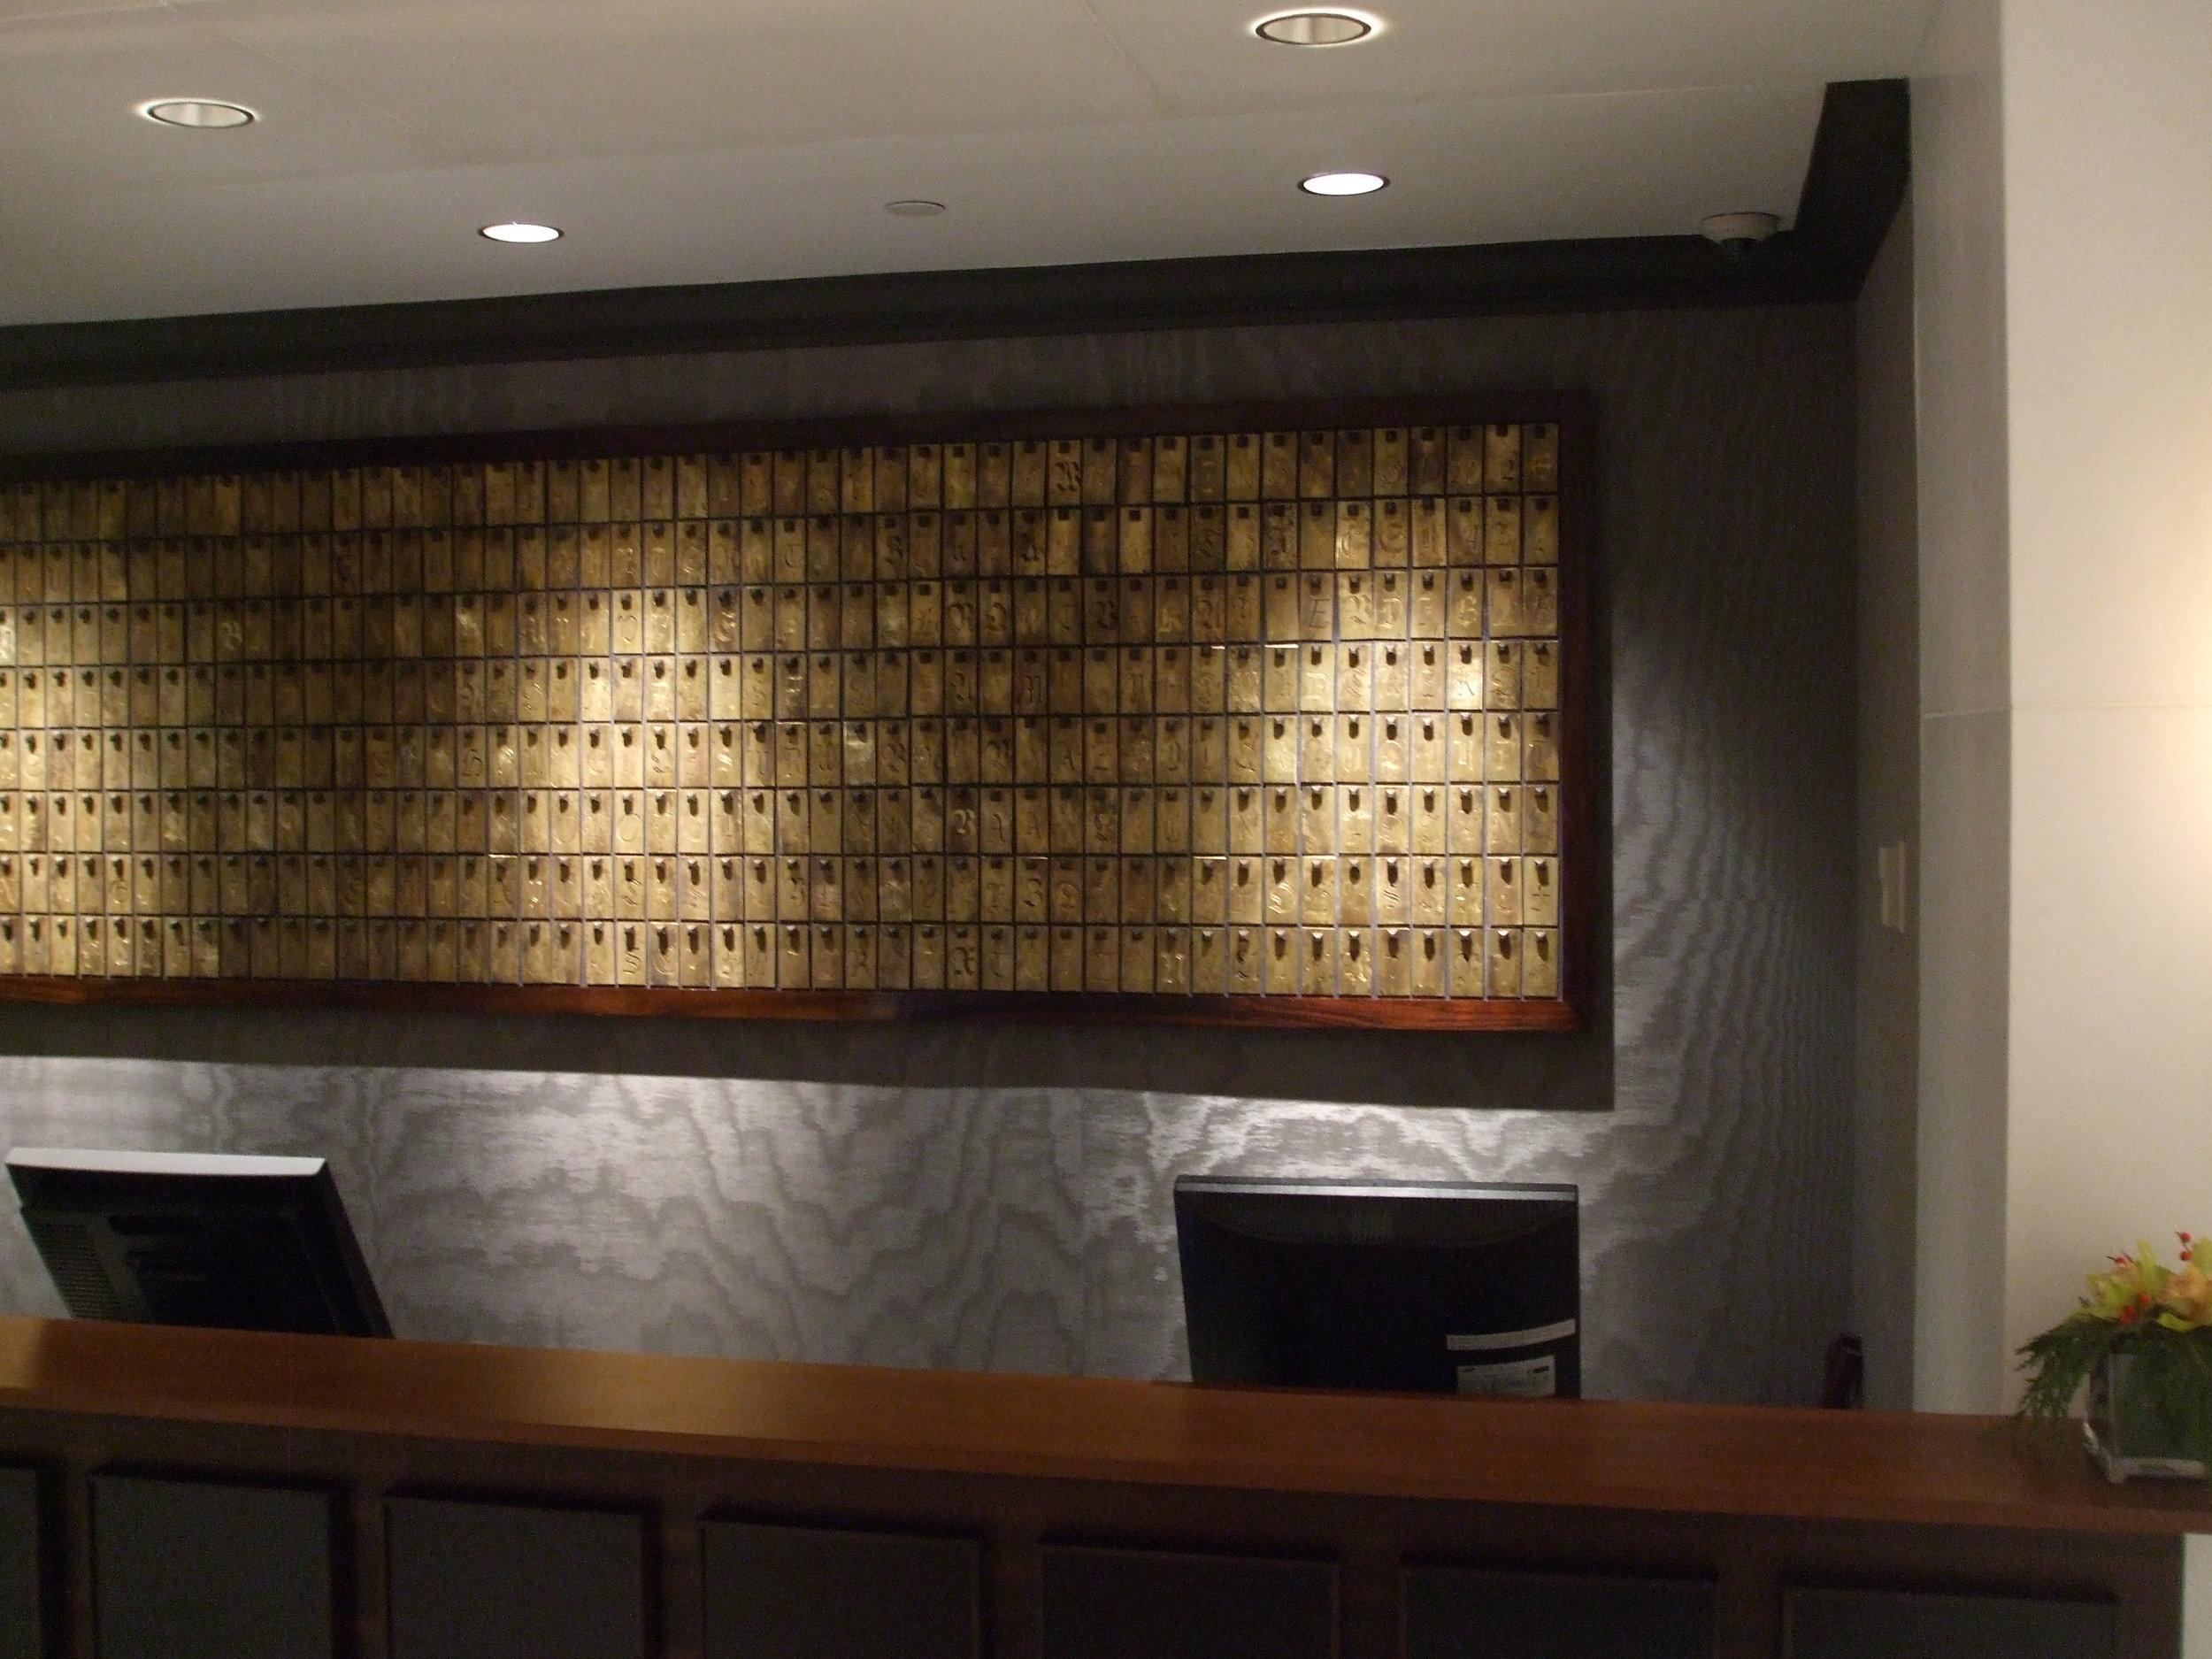 HVC-Lobby-Front Desk-DAC Art Piece-Art 100 (3) copy (deleted d9f2eac76f1f9f5733933532097d3978).JPG